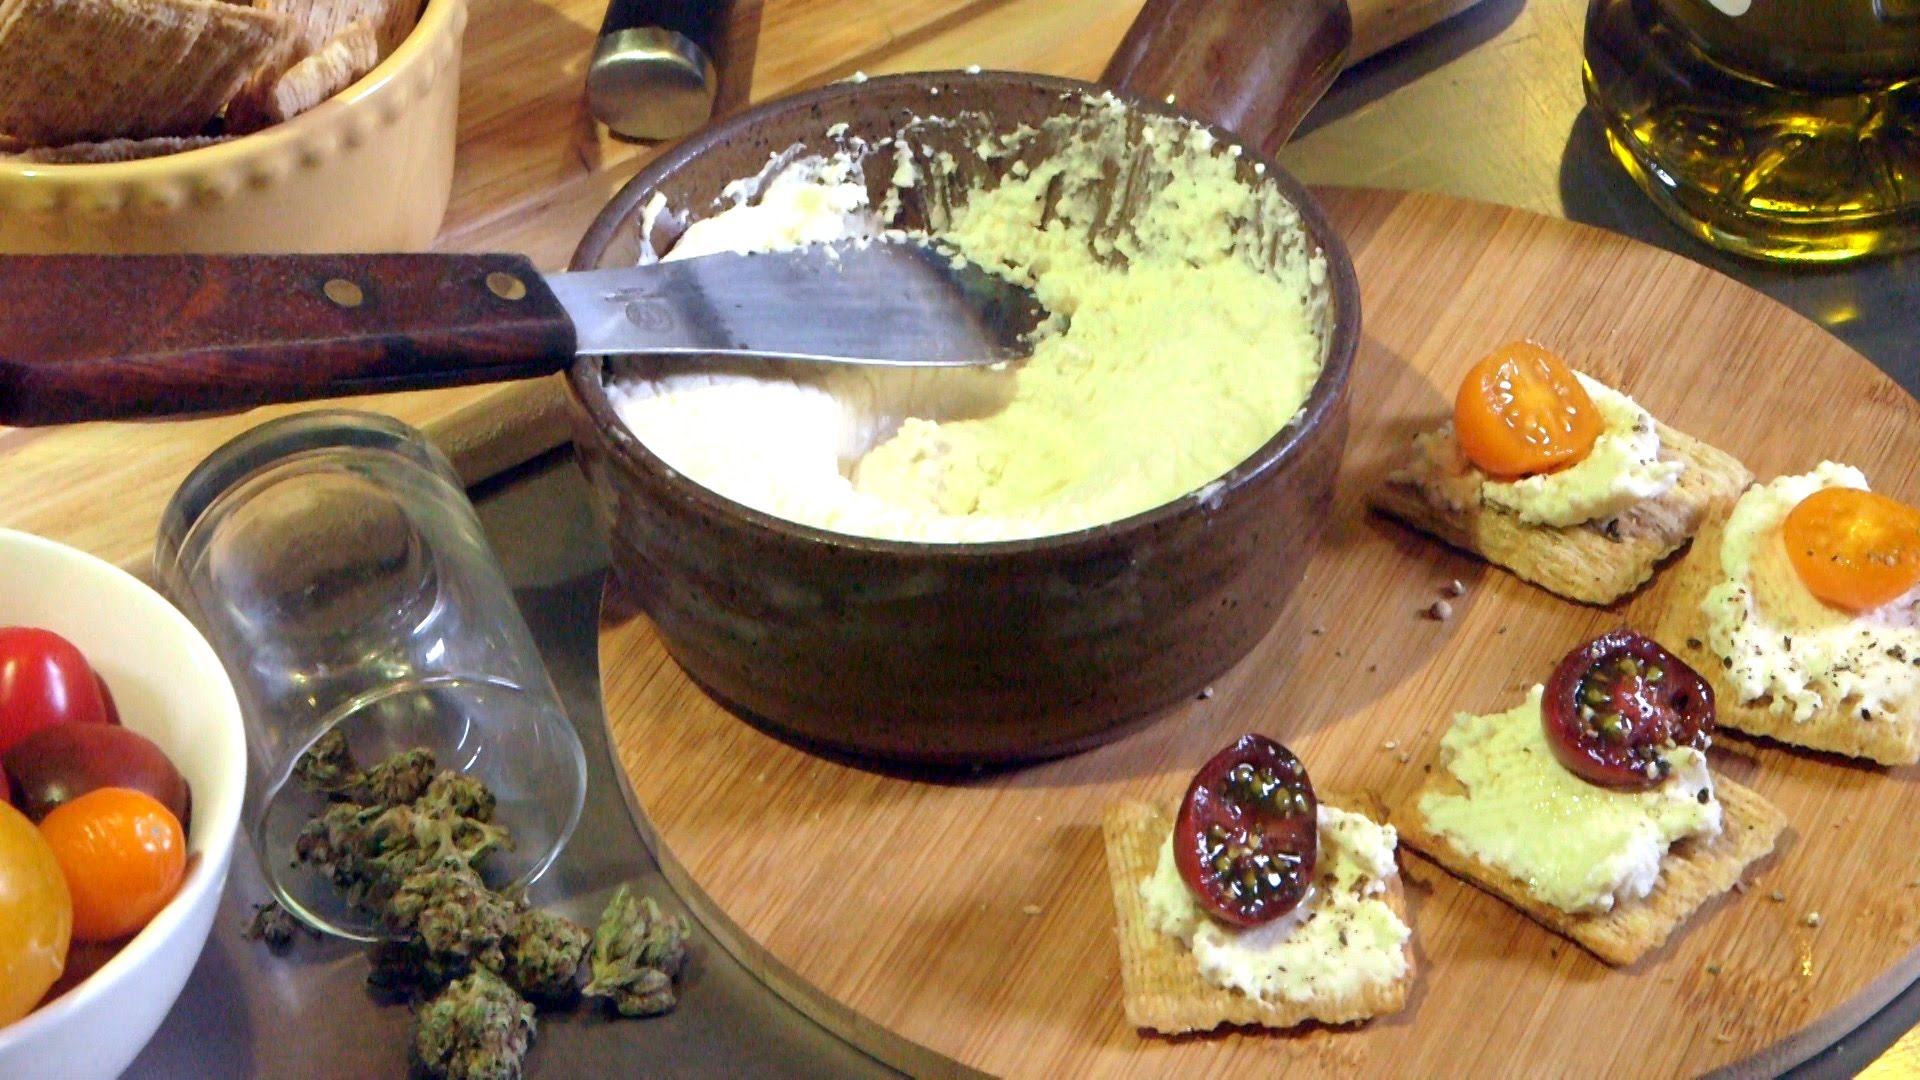 How to Make Cannabis Cheese (Homemade Marijuana Infused Cheese Recipe): Cannabasics #23